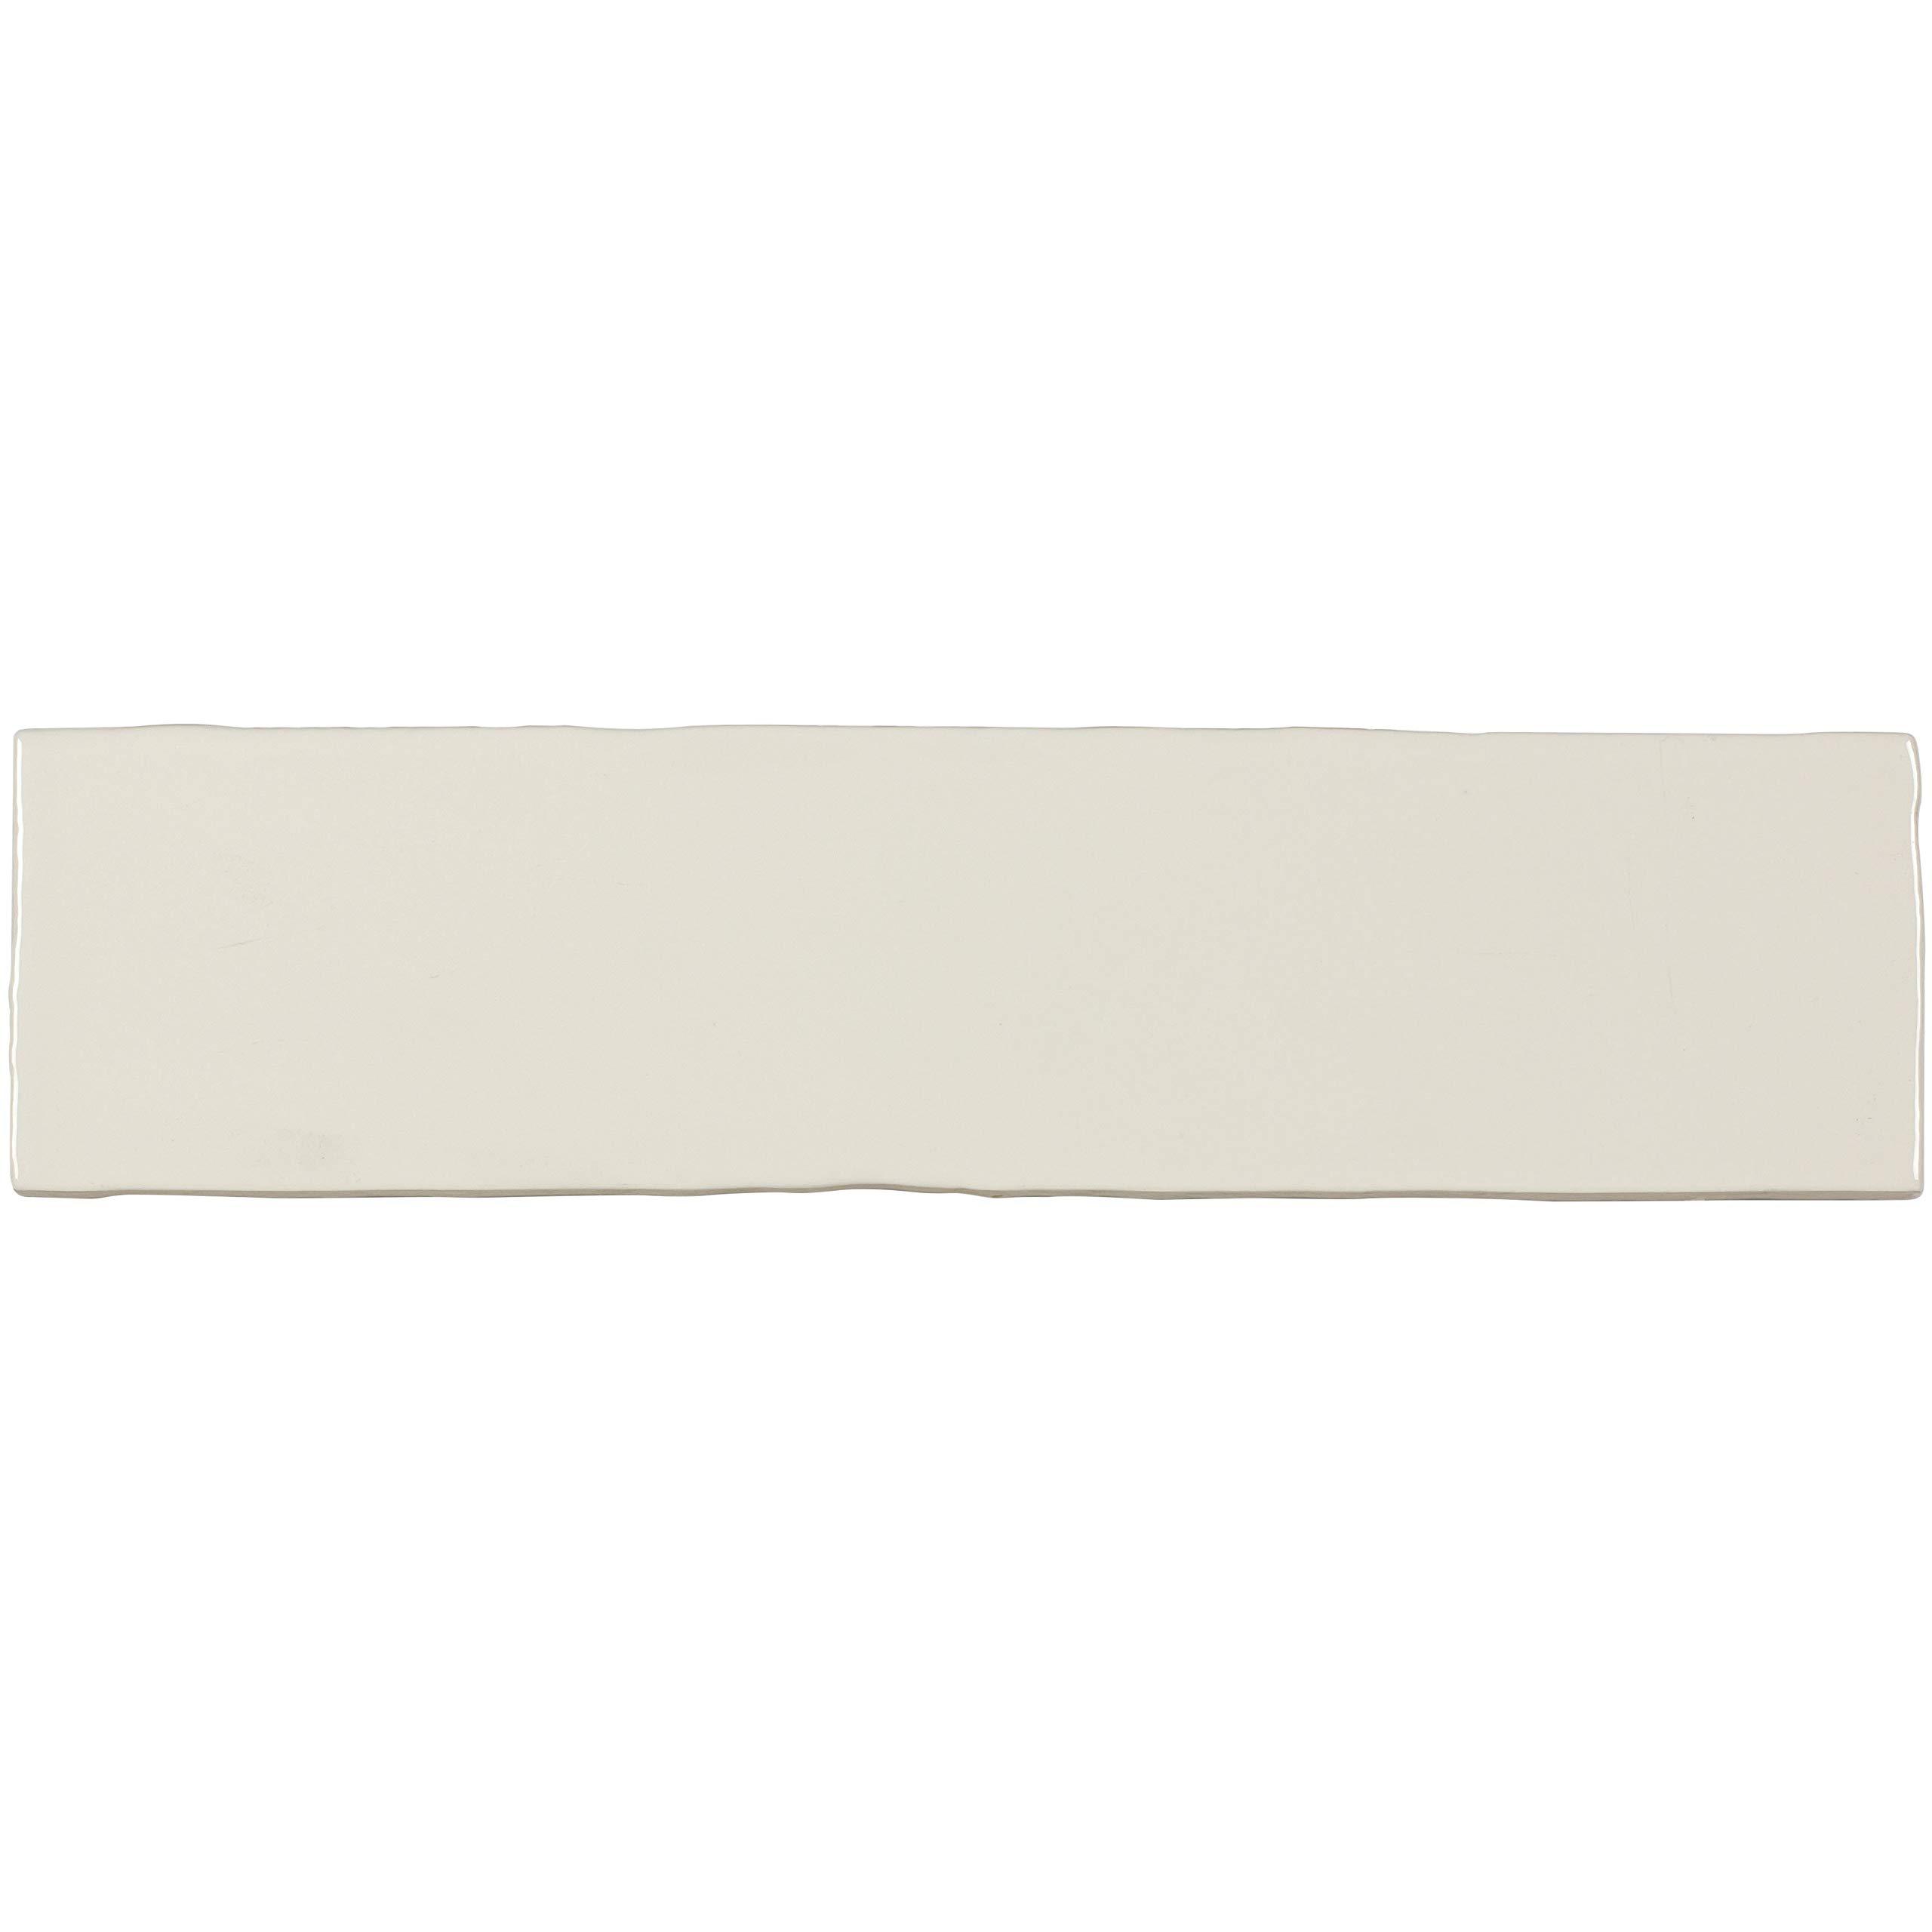 MTO0440 Classic Subway Off White Glossy Ceramic Tile